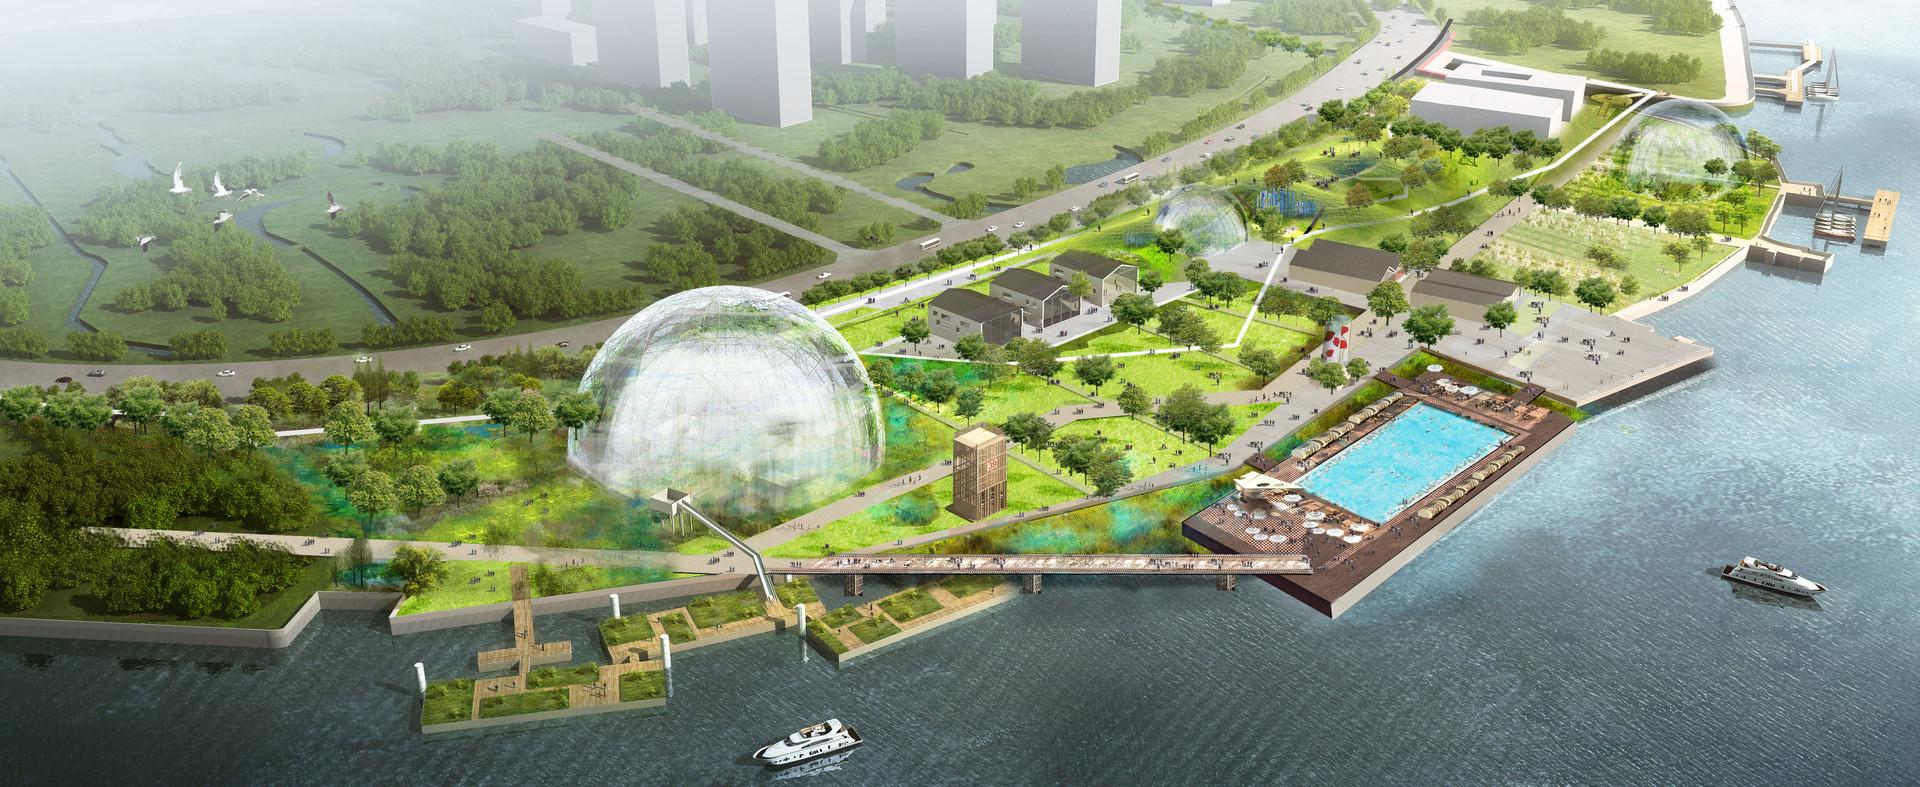 Agence Ter_21km Shanghai_ projet lauréat